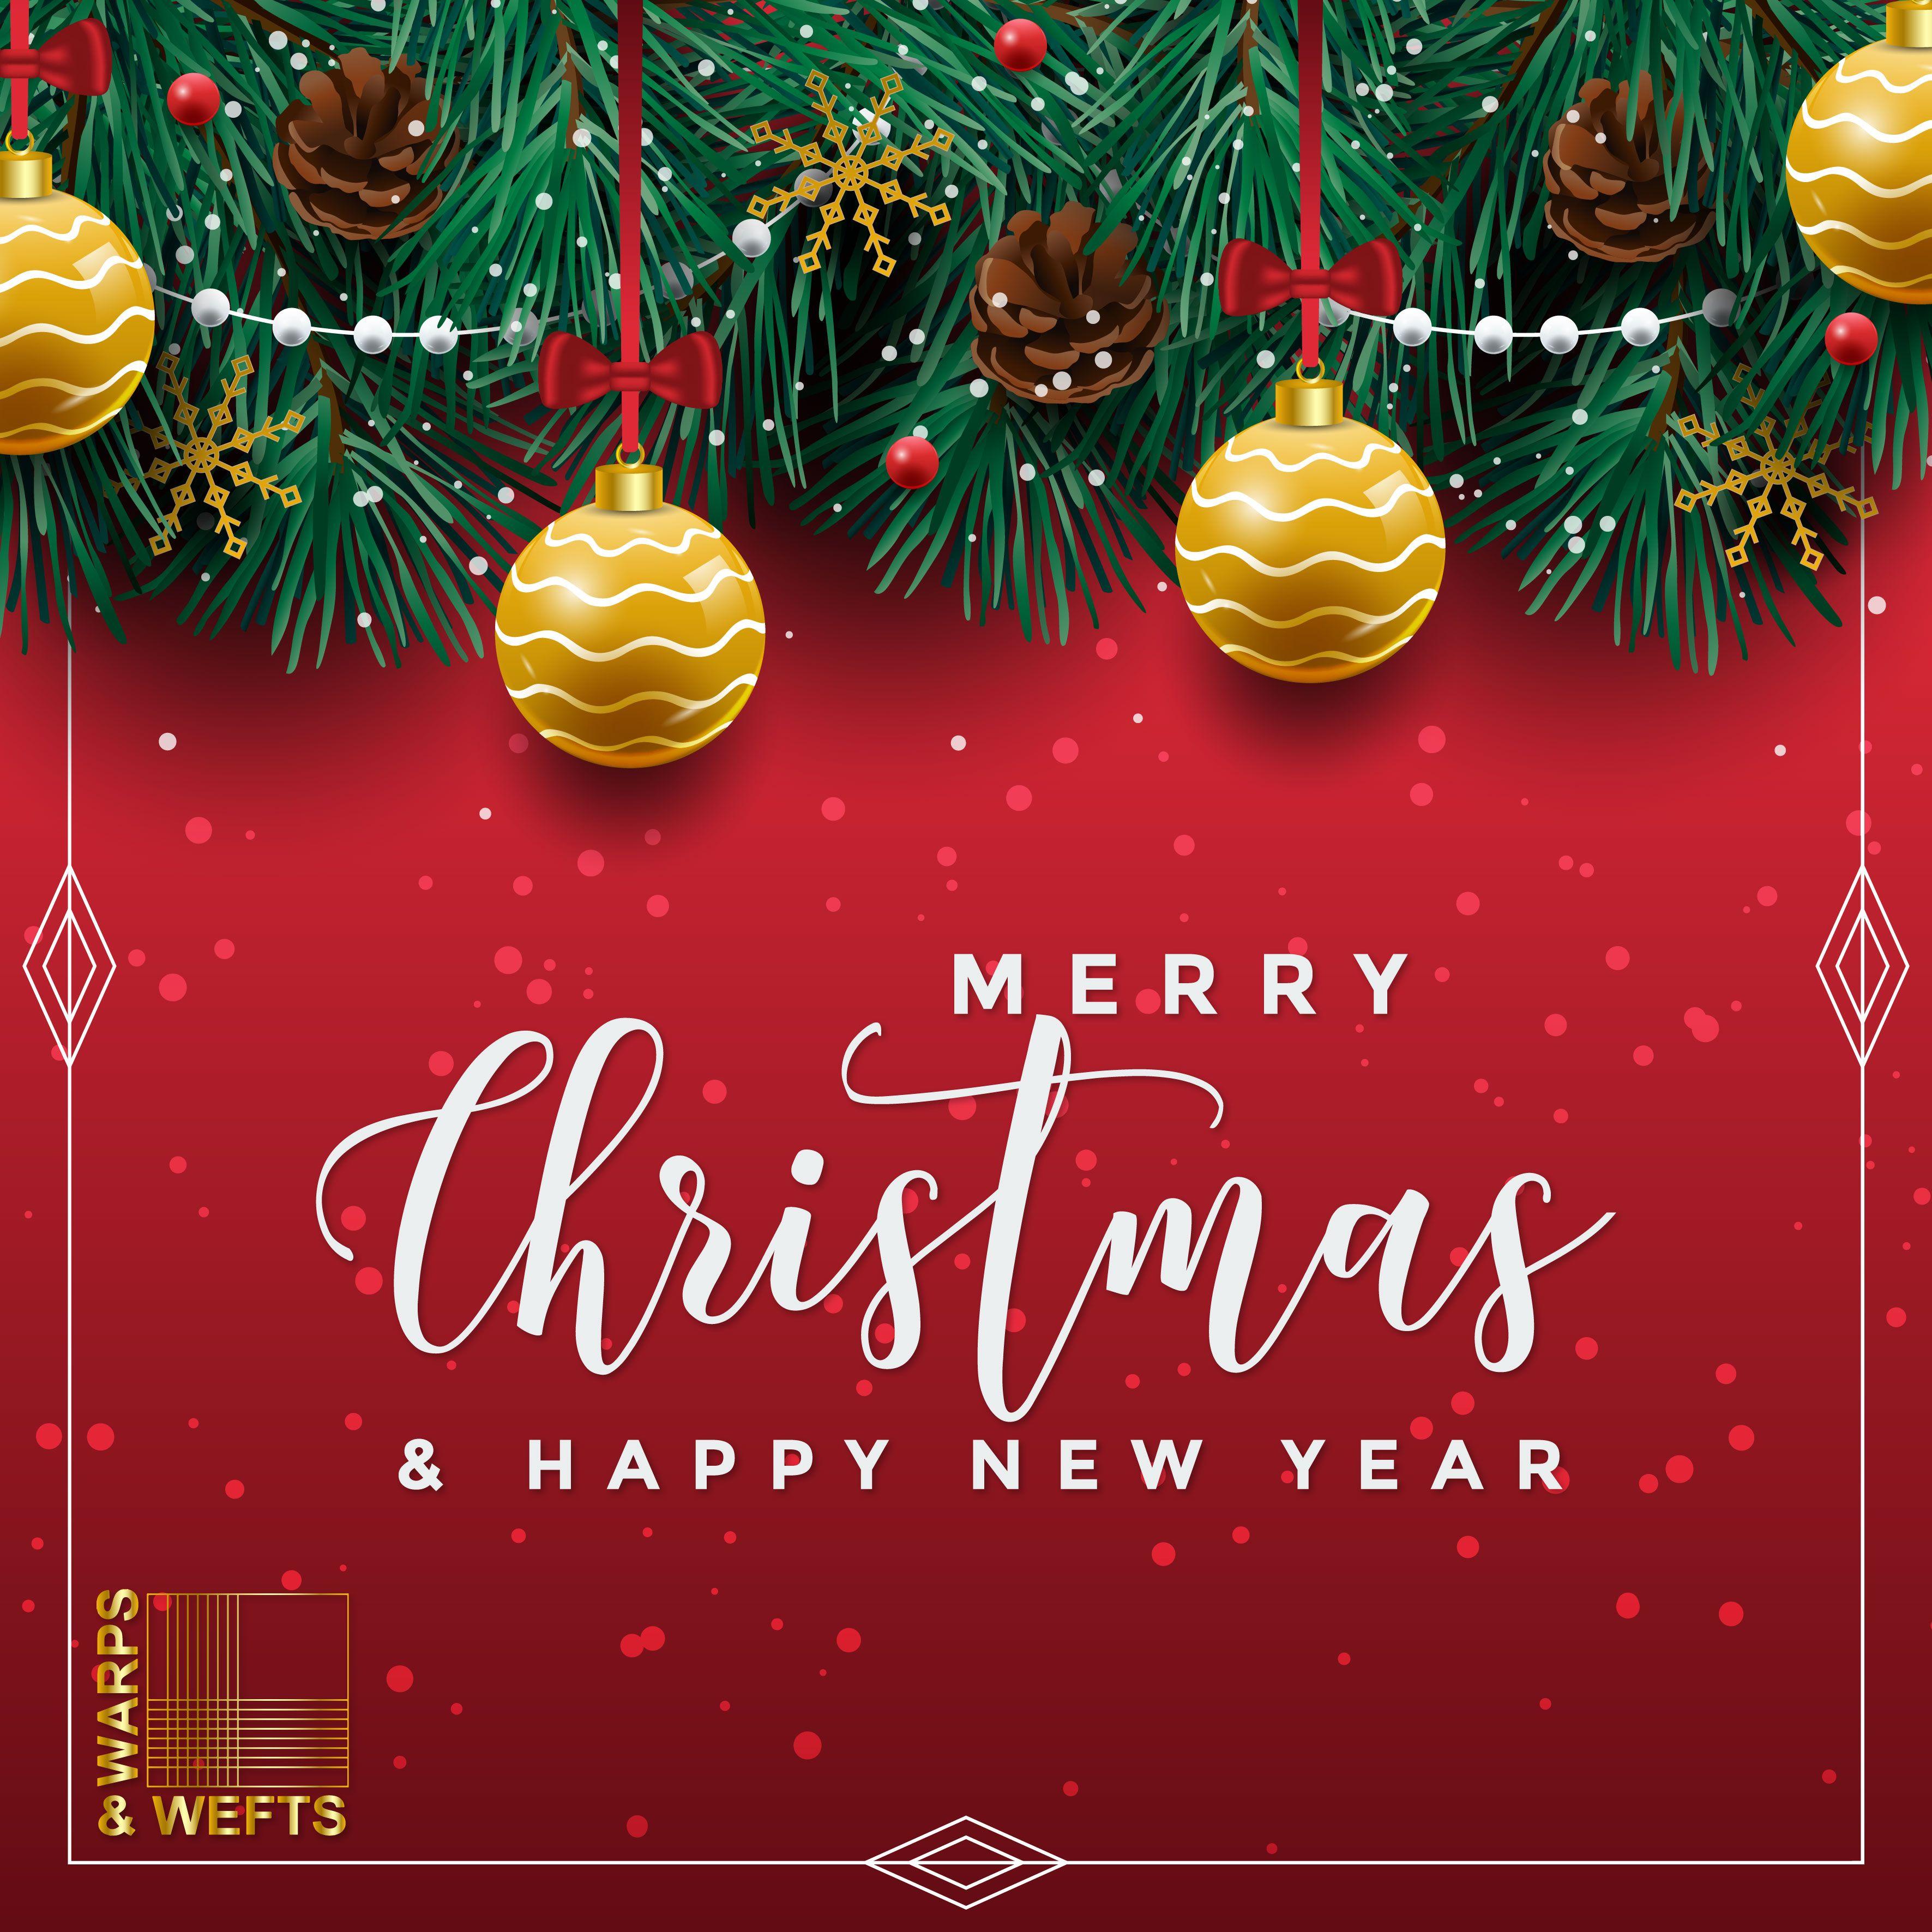 Merry Christmas Happy New Year Merry Christmas Wishes Merry Christmas And Happy New Year Christmas